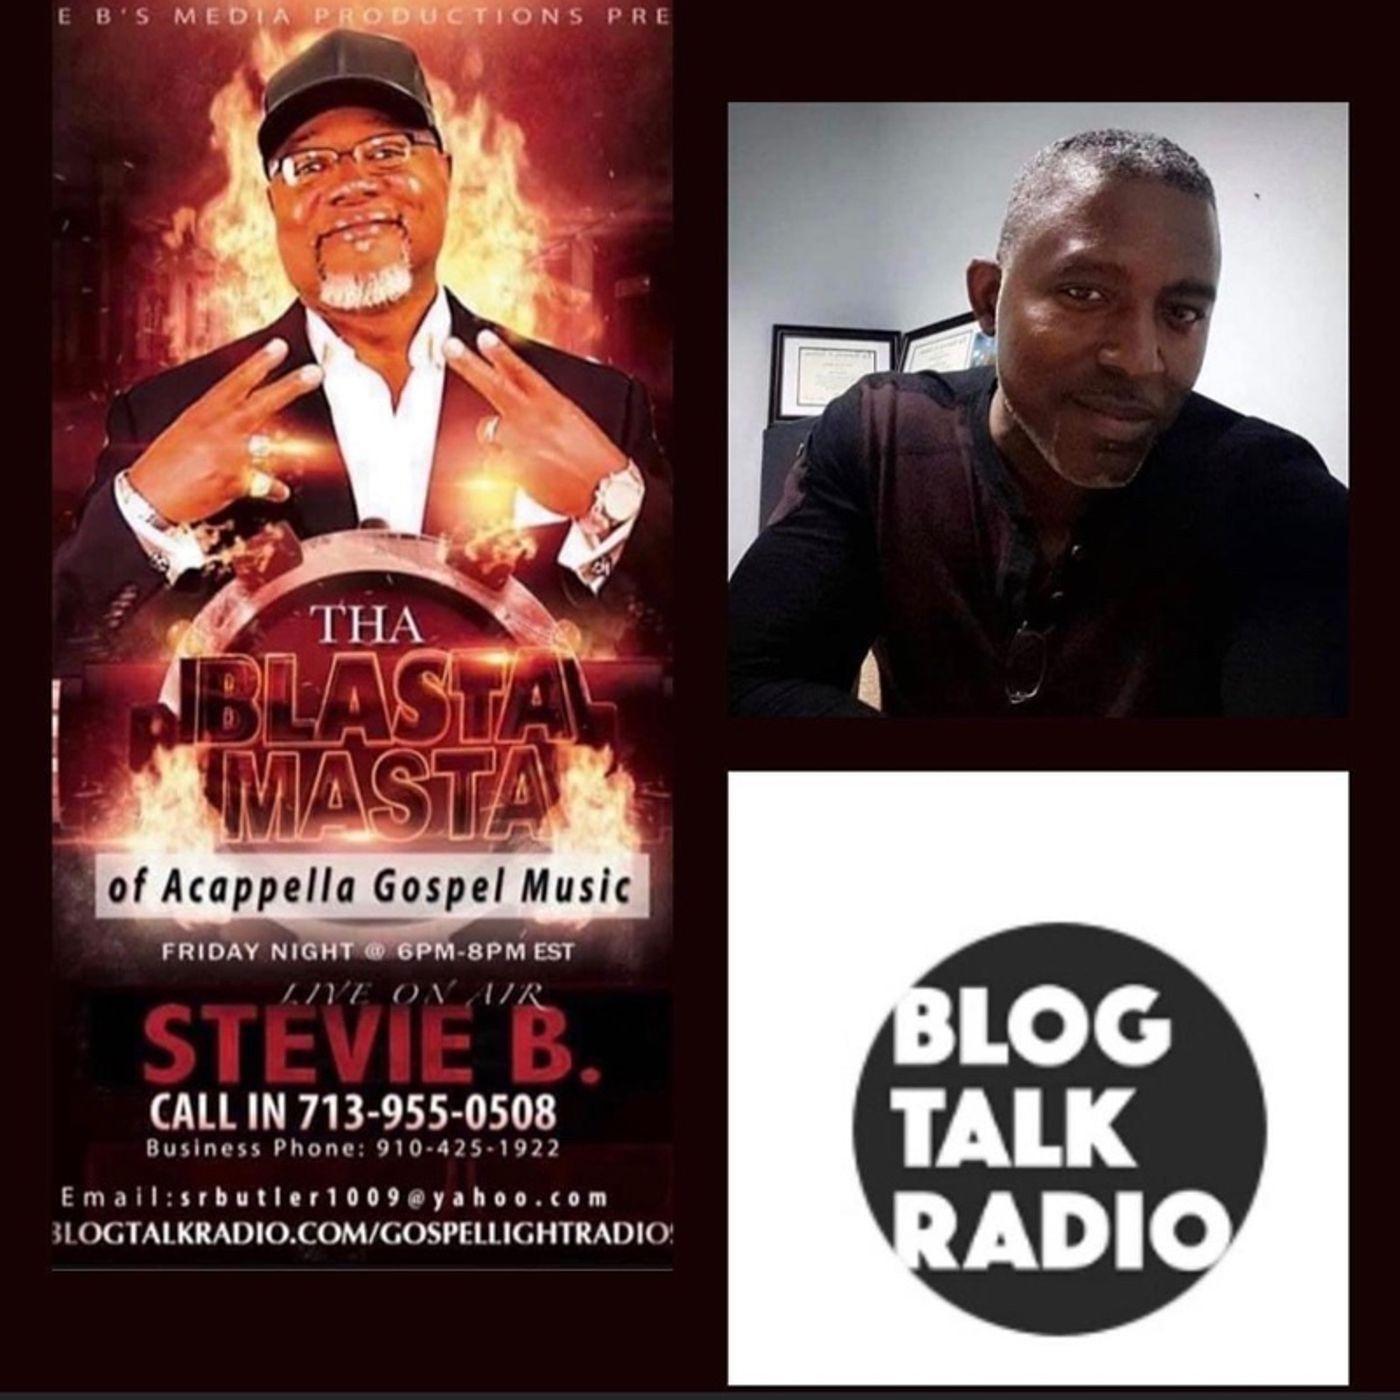 Stevie B. A Cappella Gospel Music Blast - (Episode 227)